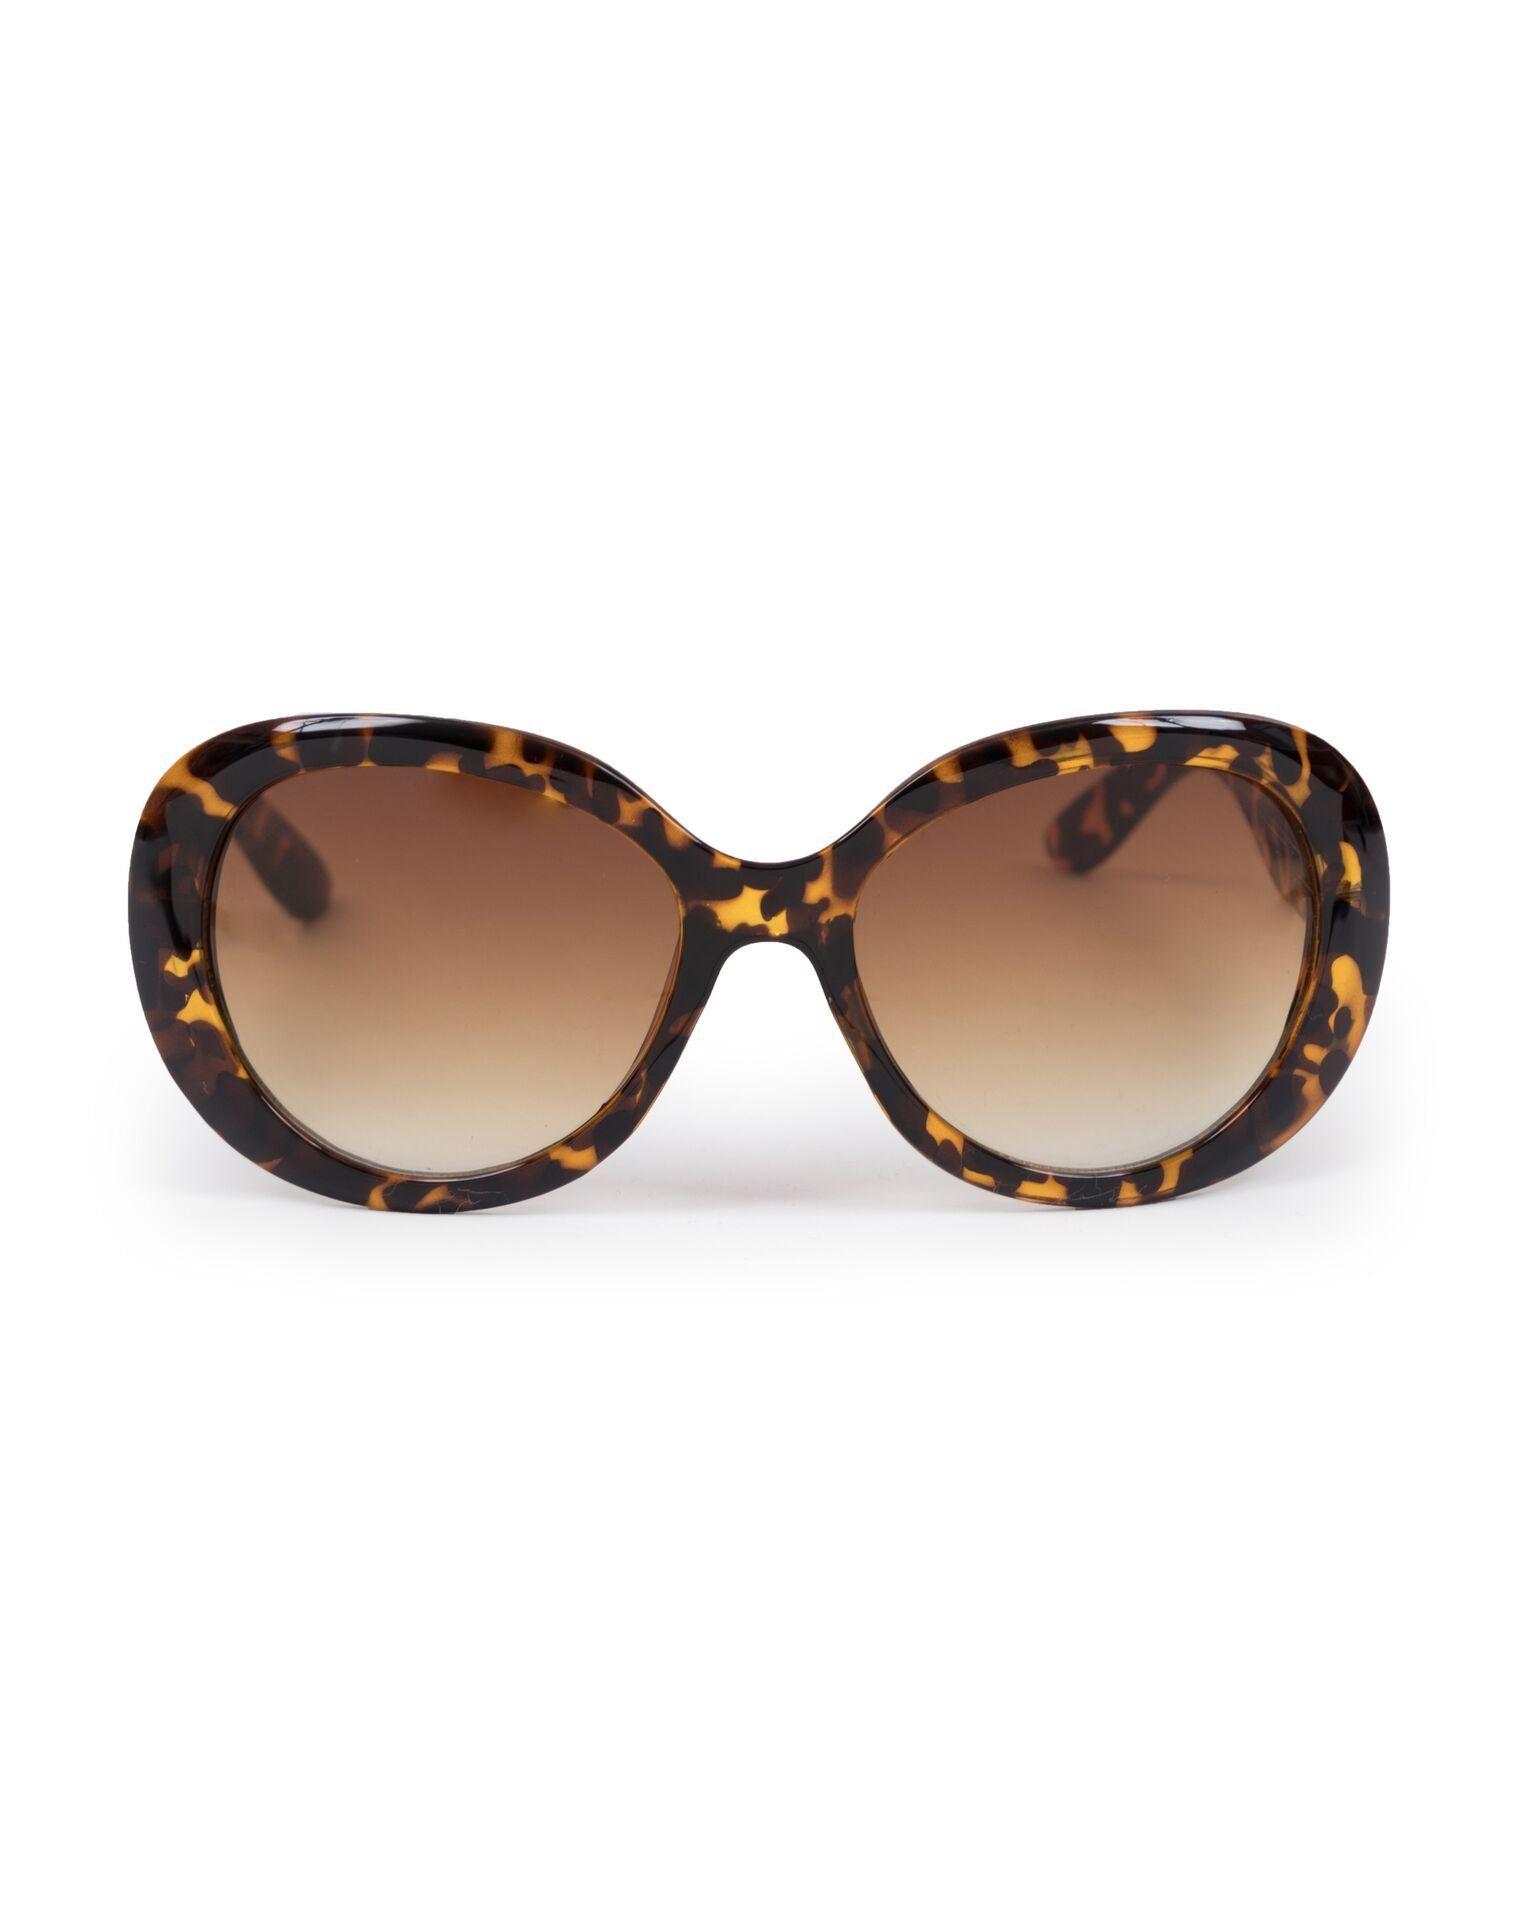 Powder Britt Sunglasses in Tortoiseshell